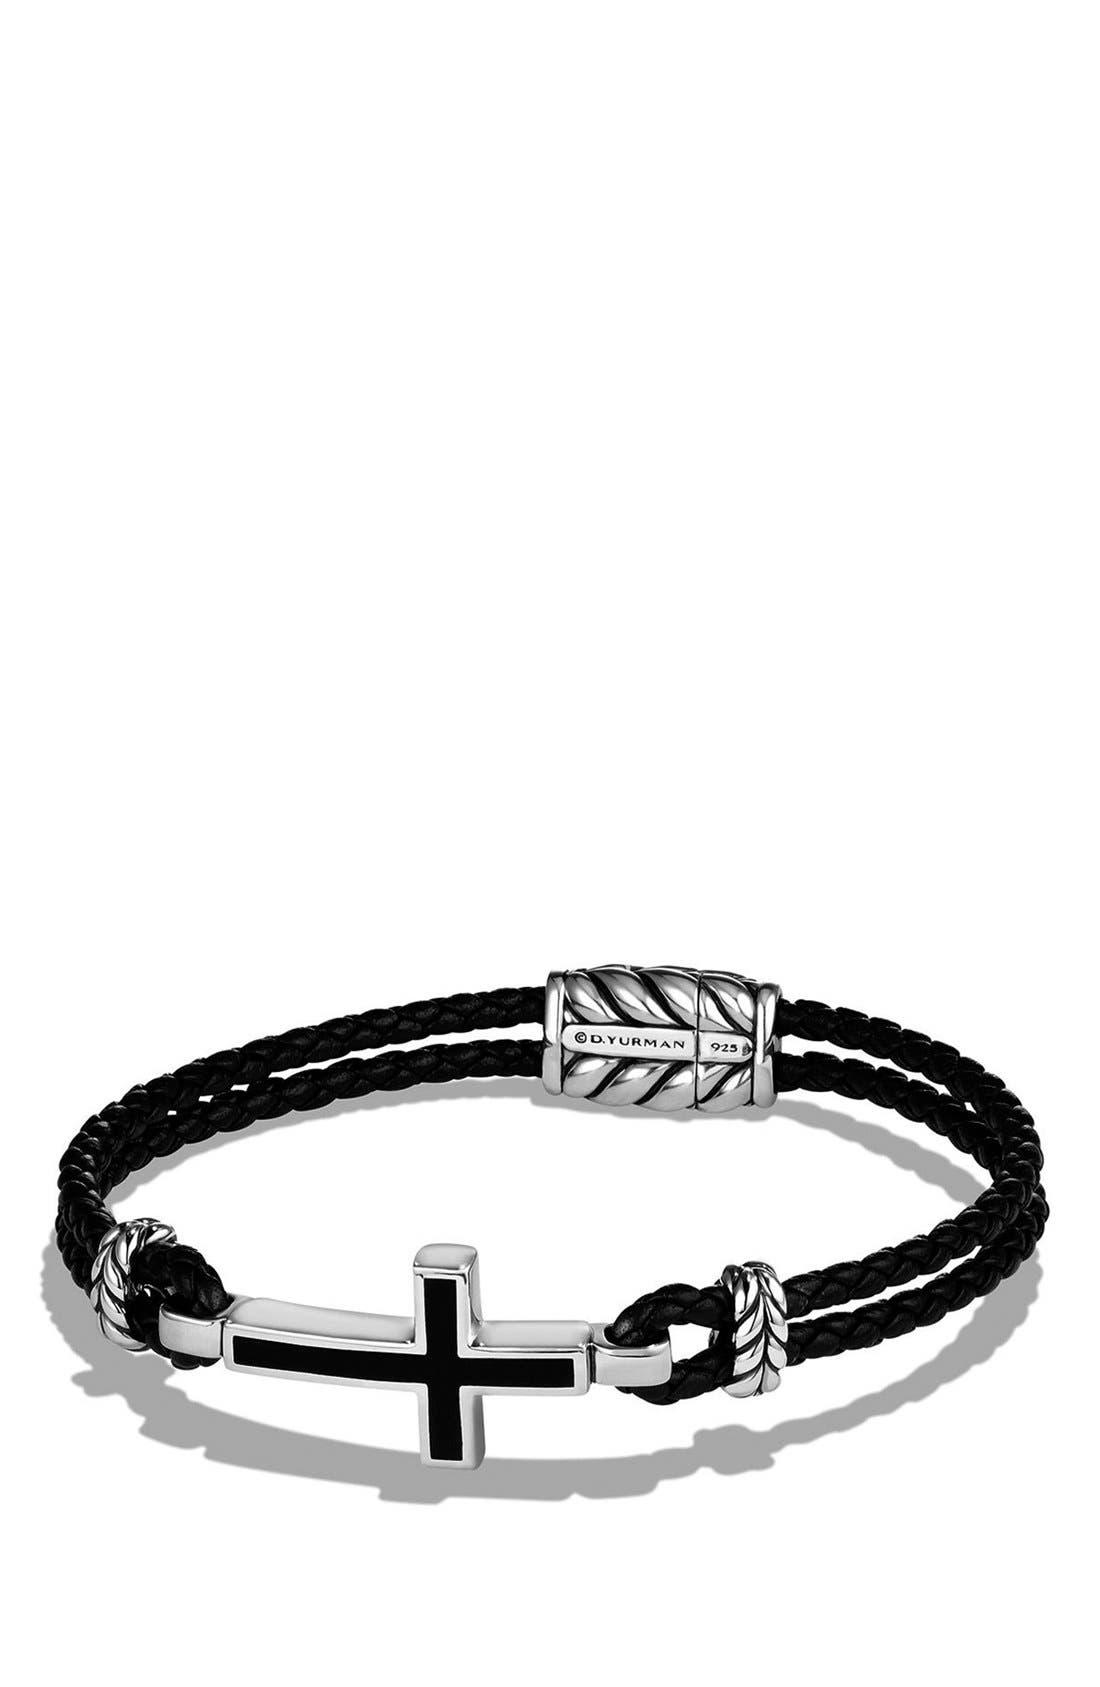 David Yurman 'Exotic Stone' Cross Station Leather Bracelet with Black Onyx